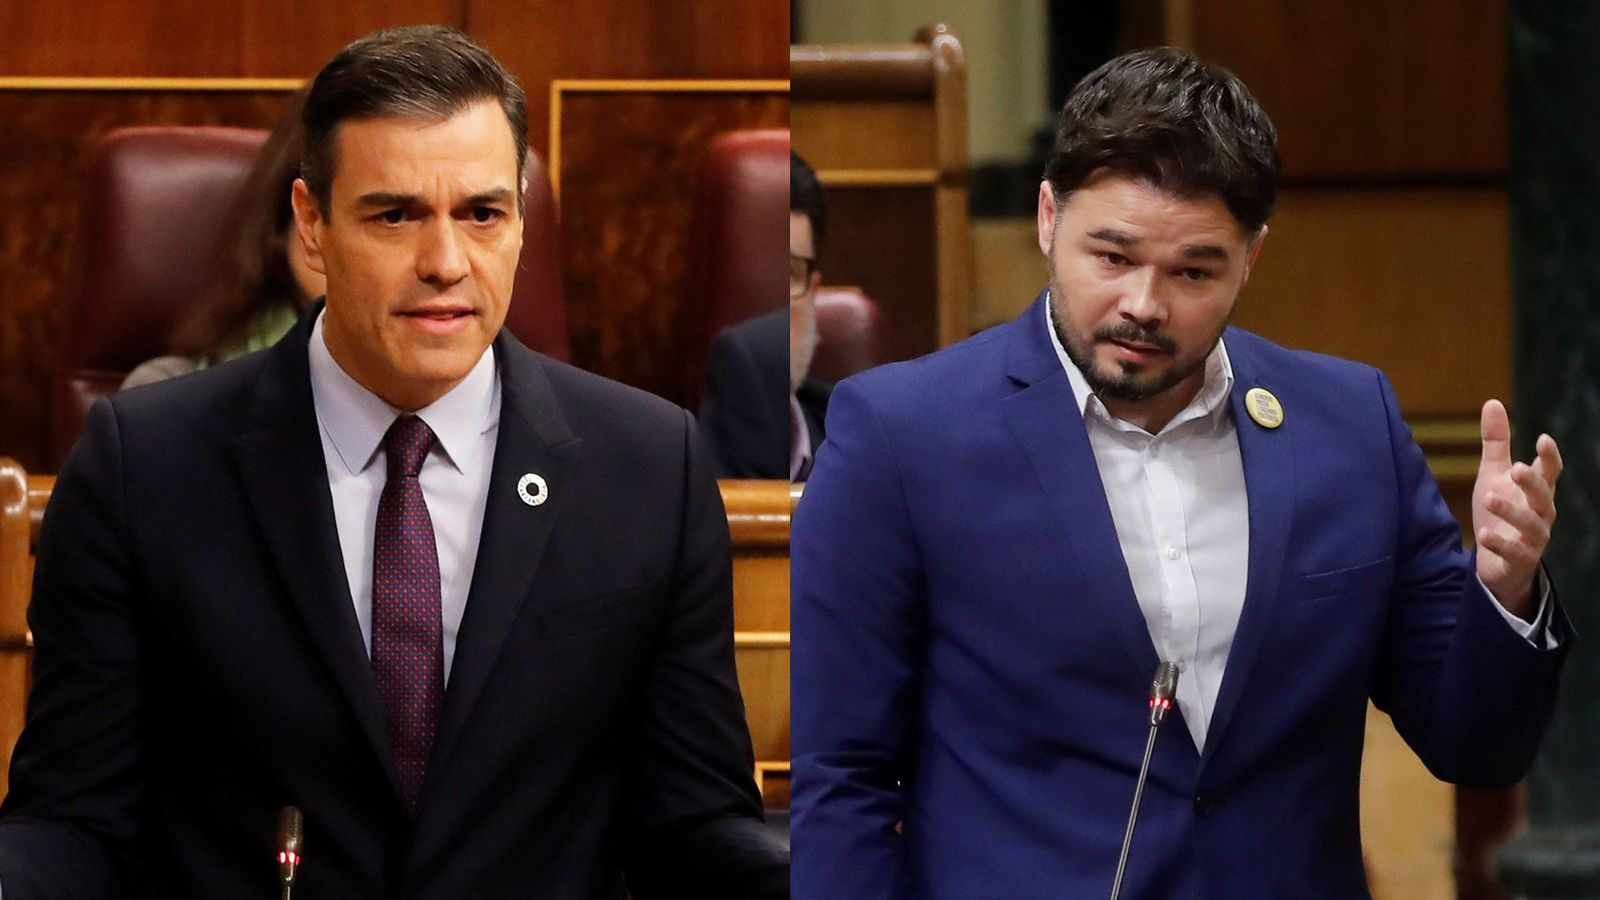 L'anàlisi d'Antoni Bassas: 'Rufián i la pregunta suau al govern espanyol'